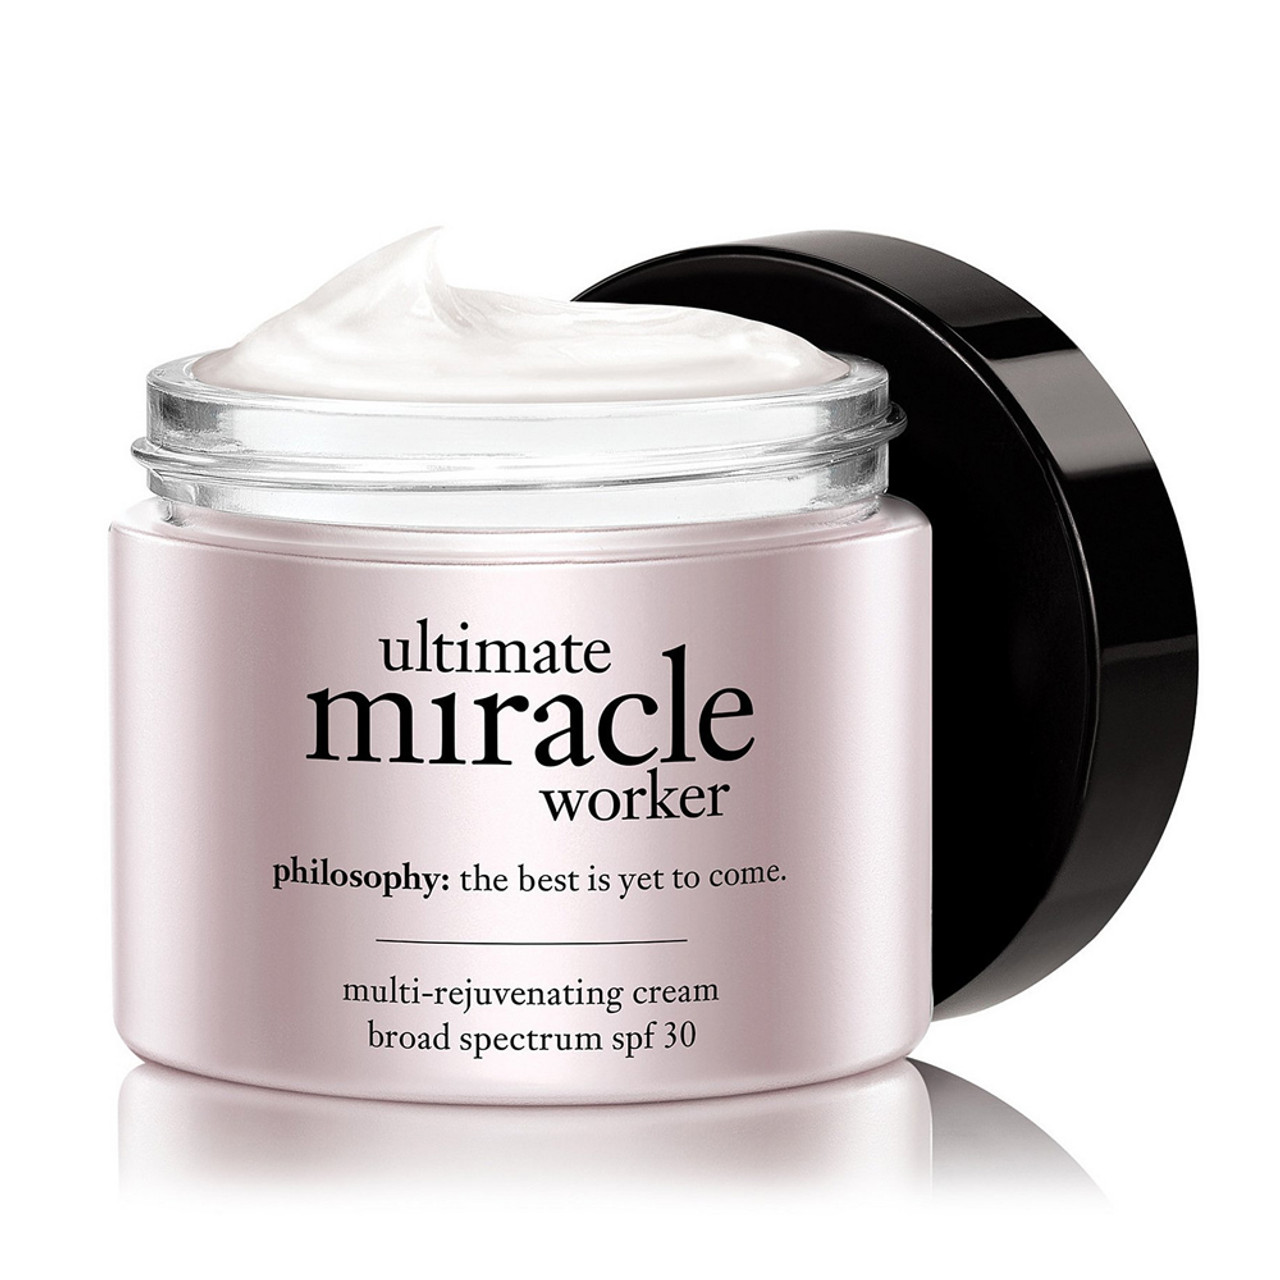 philosophy Ultimate Miracle Worker Multi-Rejuvenating Cream SPF 30 BeautifiedYou.com